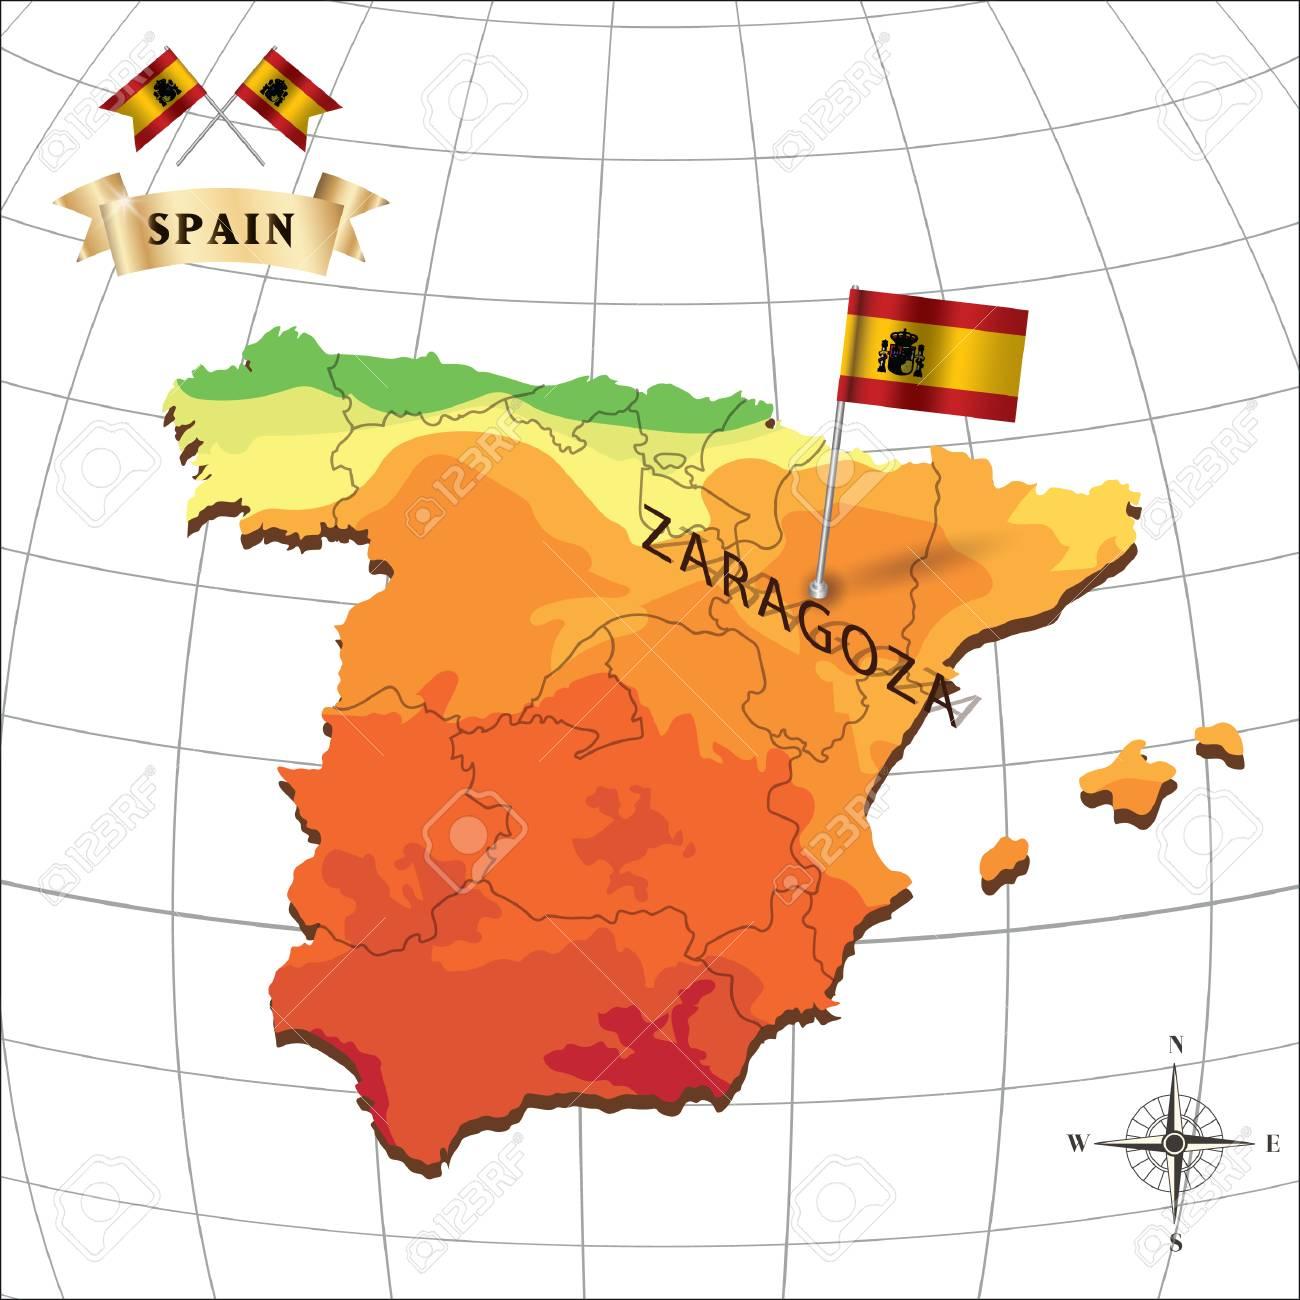 Map Of Spain Zaragoza.Map Of Spain With Zaragoza Royalty Free Cliparts Vectors And Stock